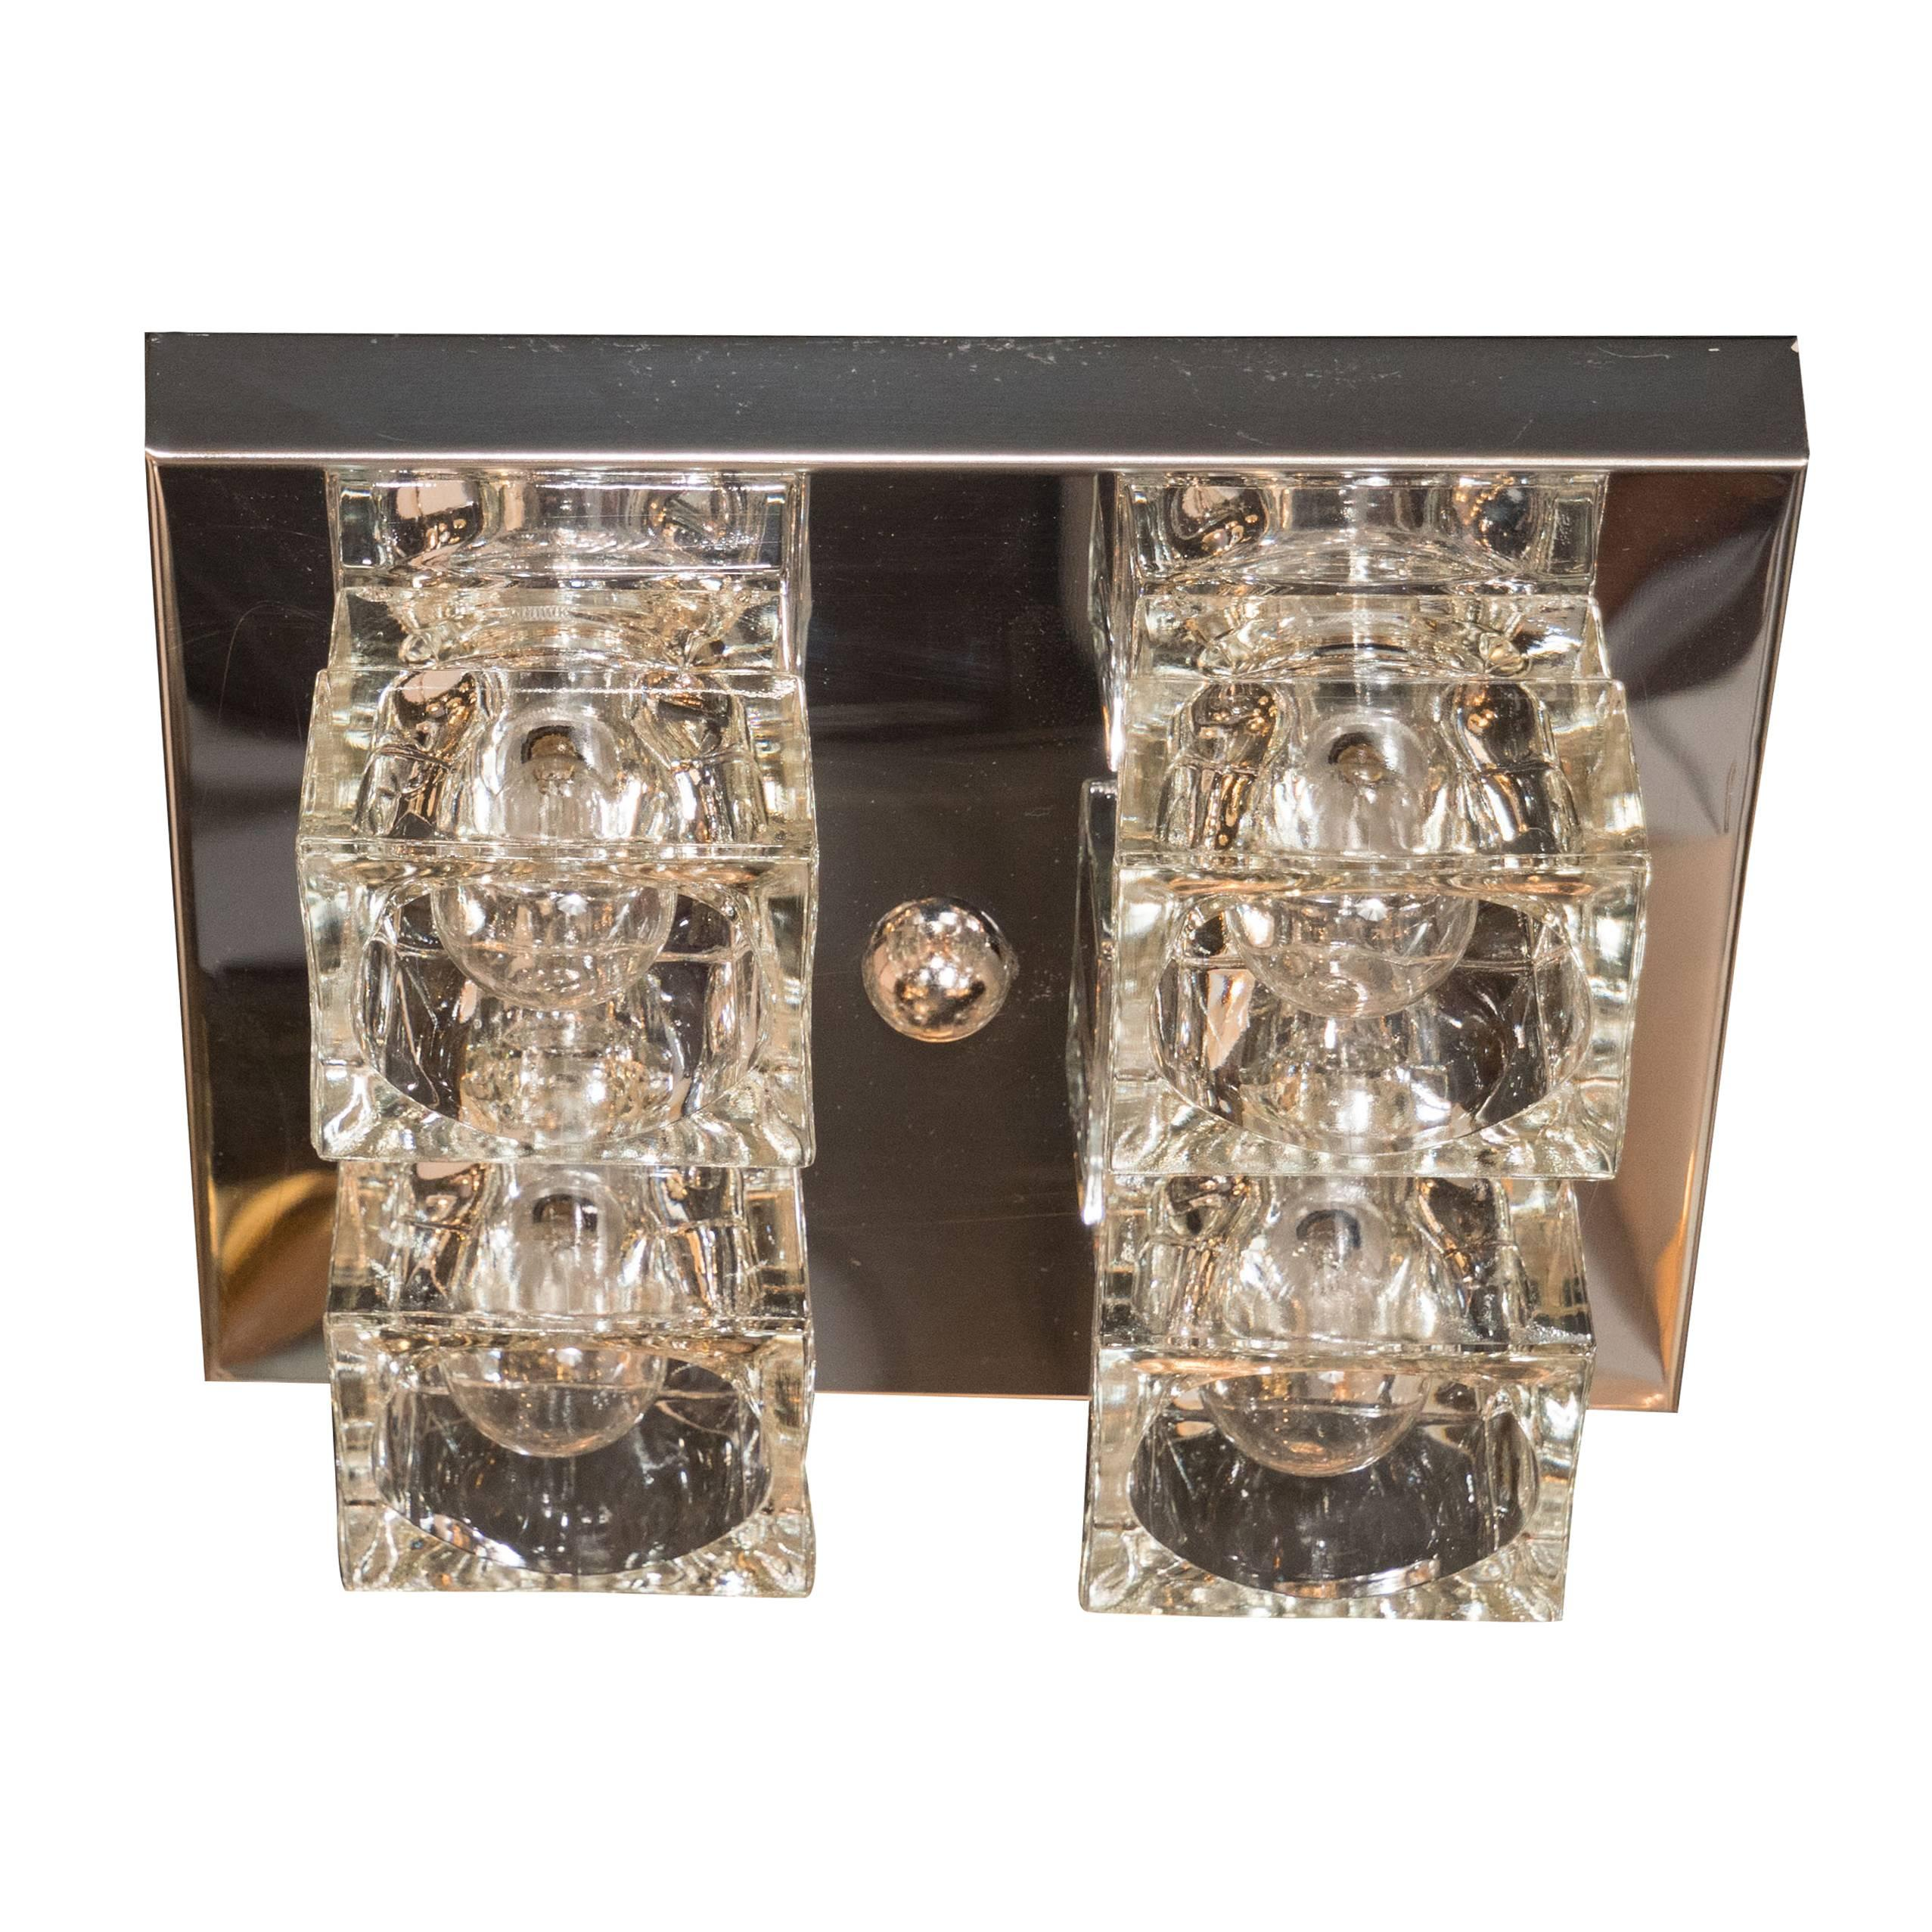 Mid-Century Modernist Glass Cube Flush Mount Chandelier by Sciolari in Chrome